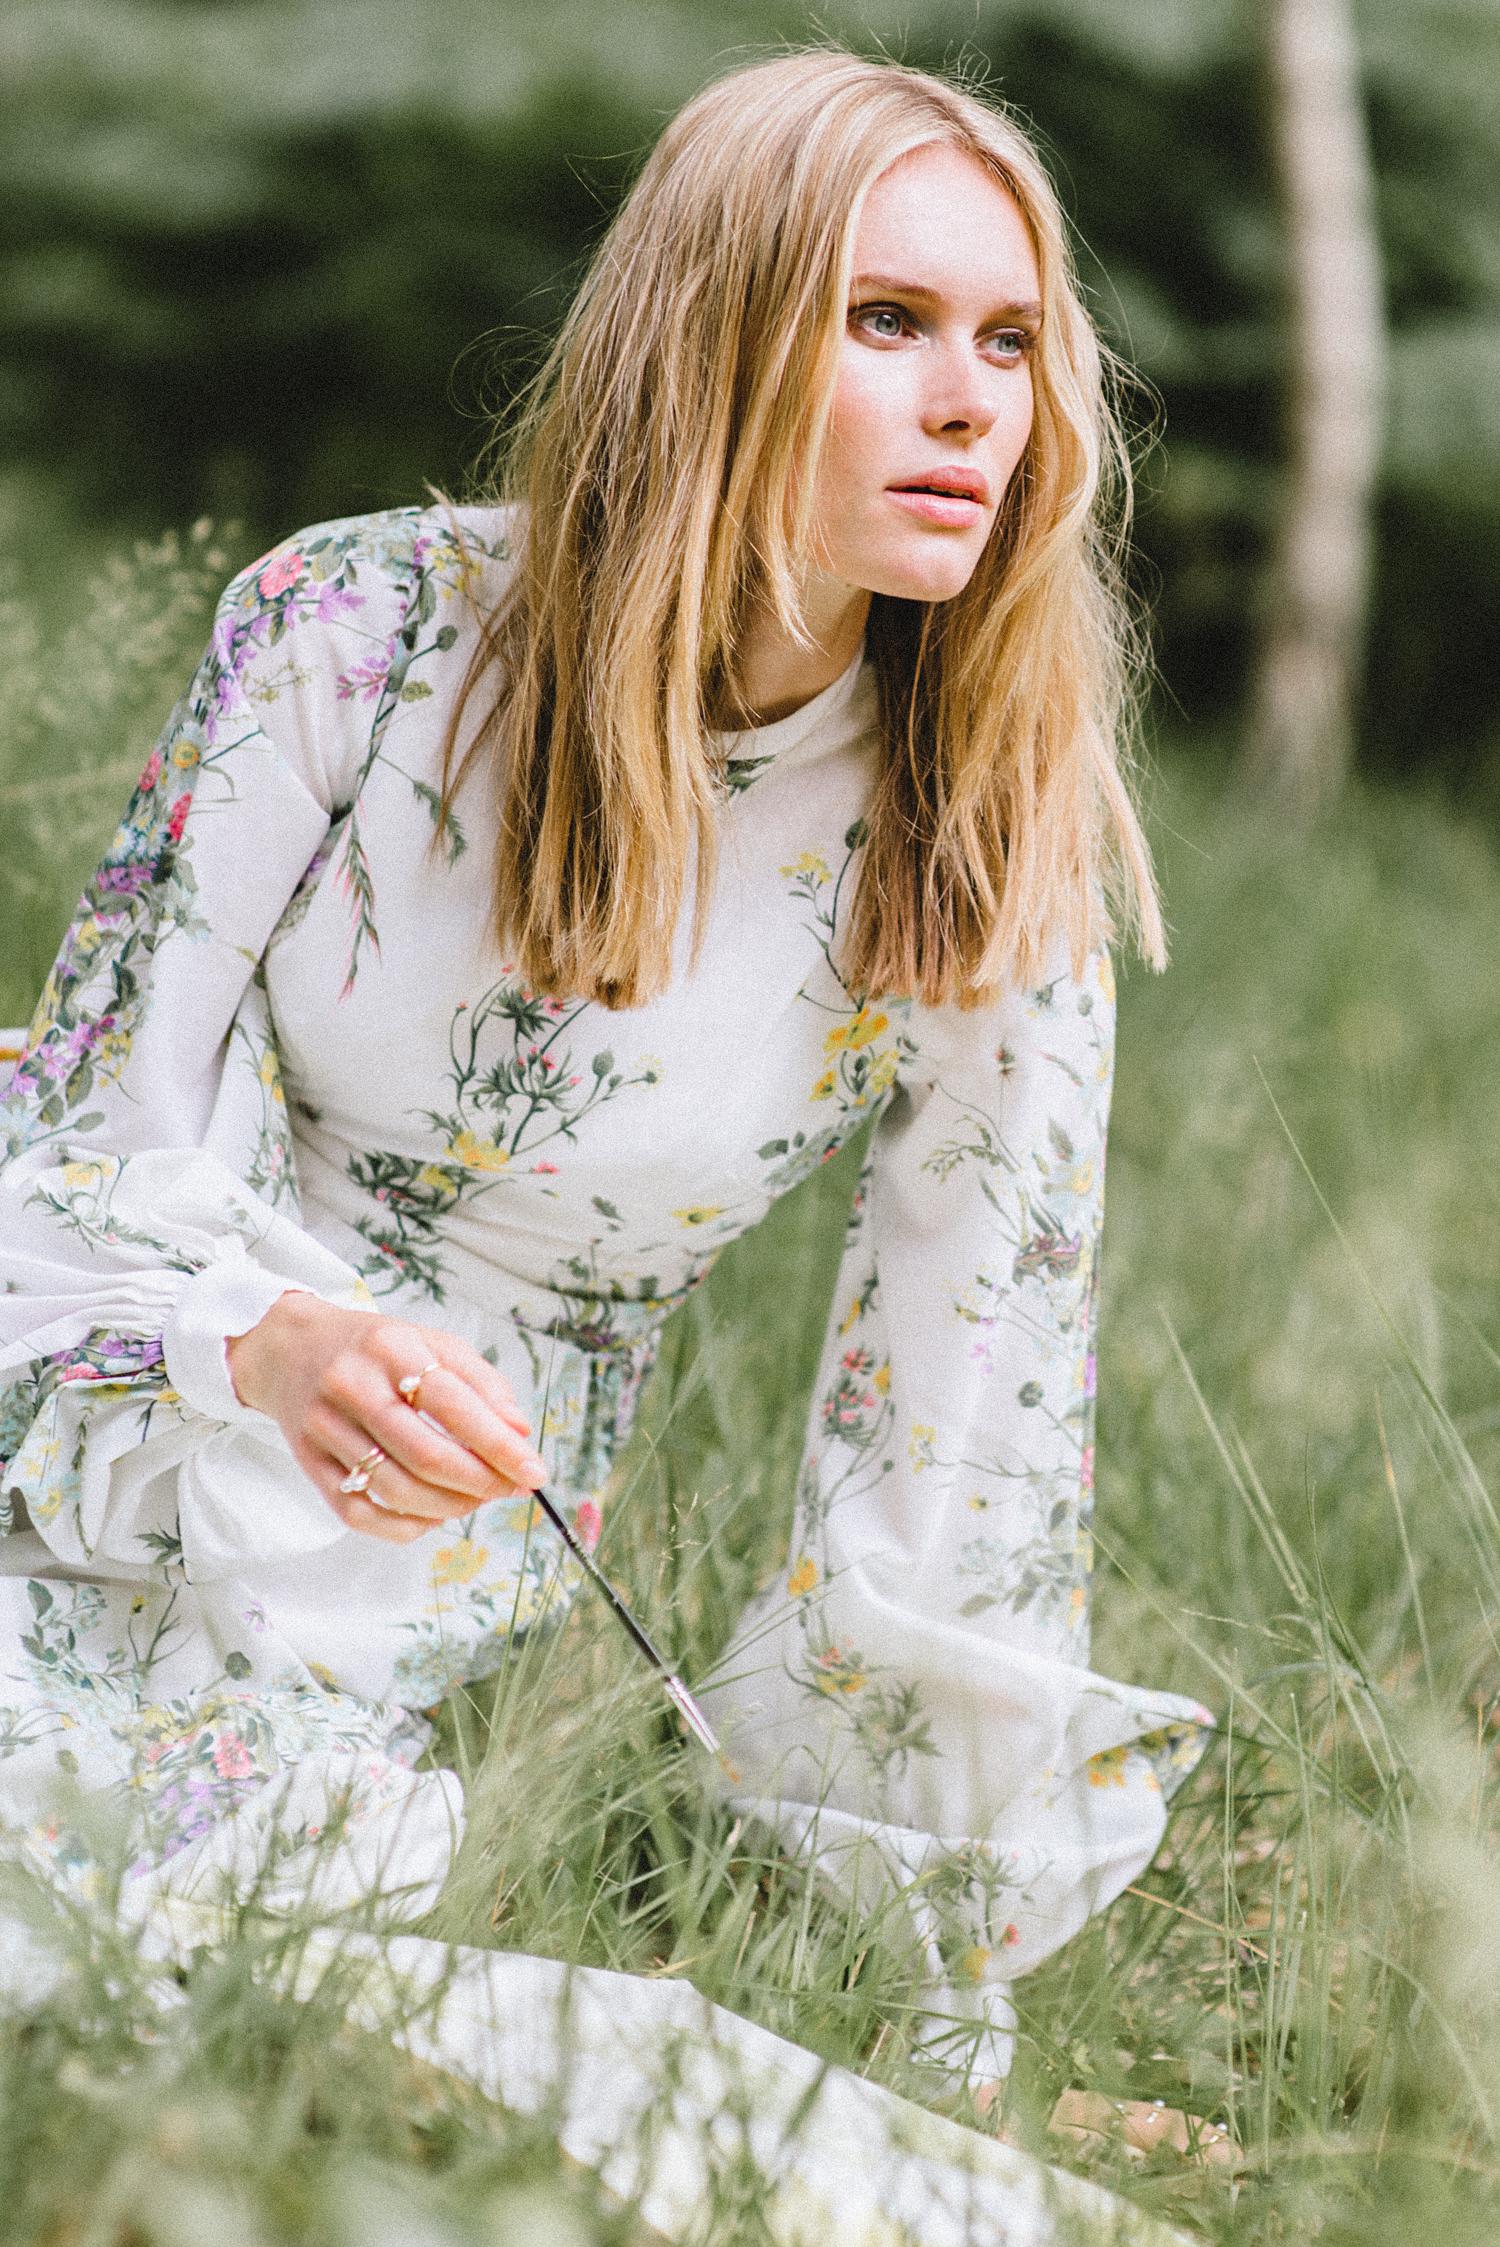 Dress Vintage Laura Ashley, Rings ASOS